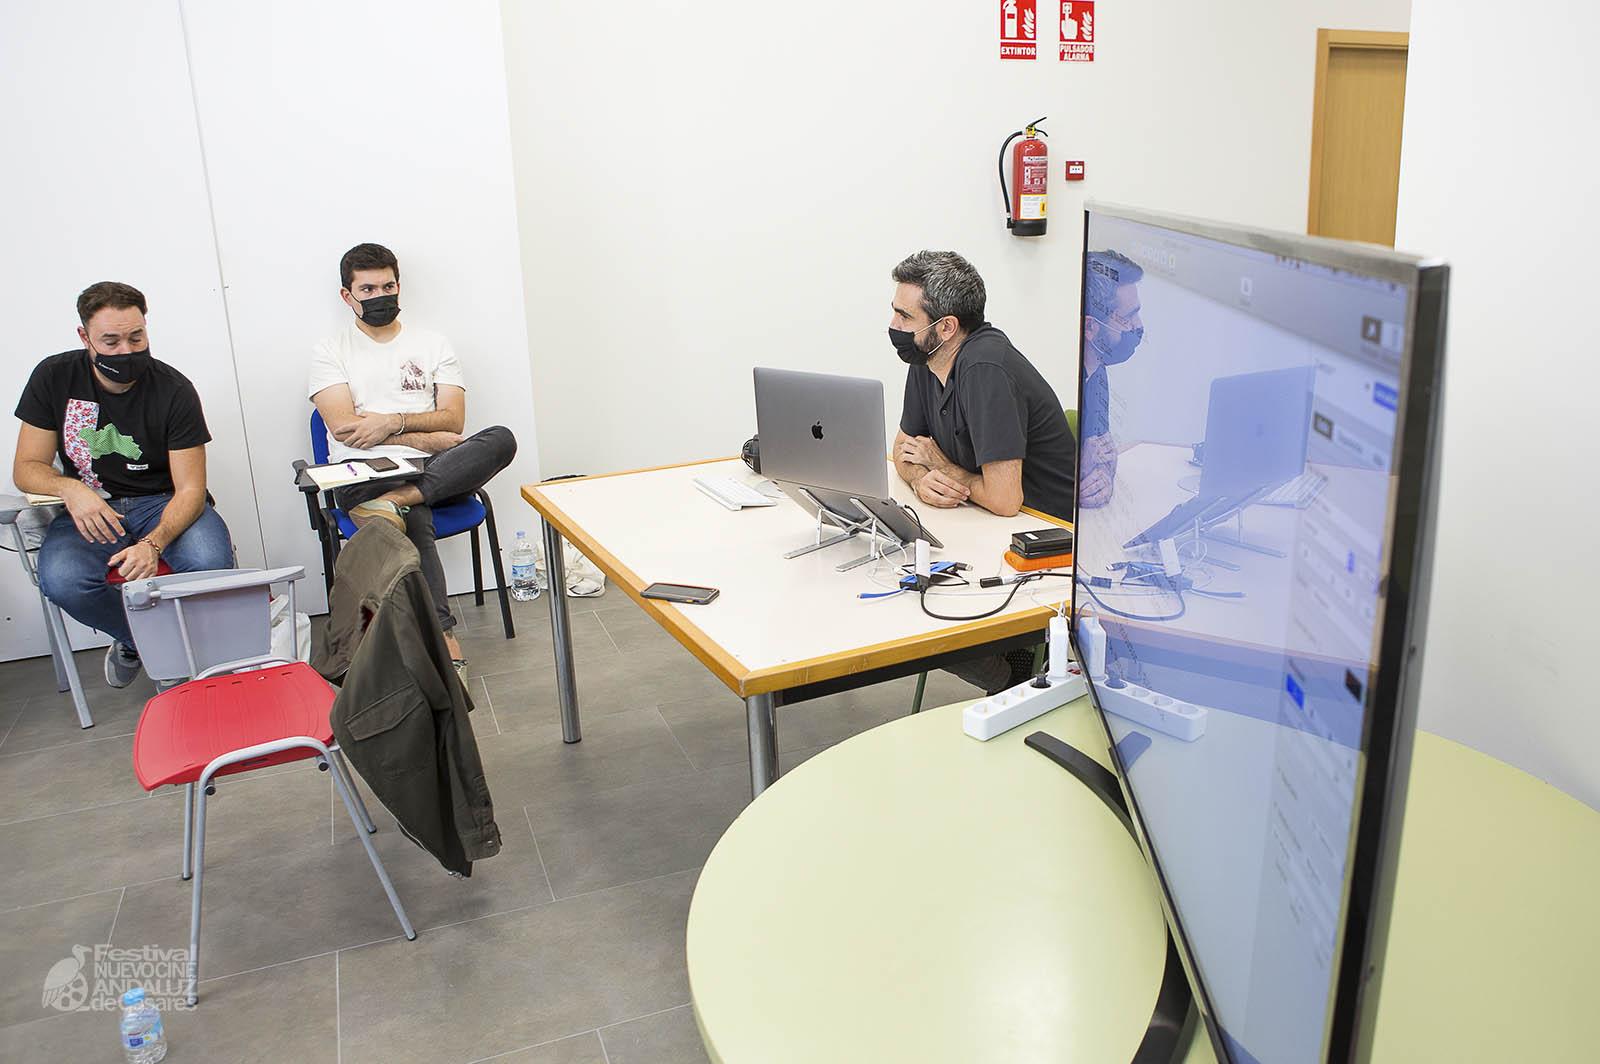 Curso de Documental para Plataformas, con Jorge Laplace